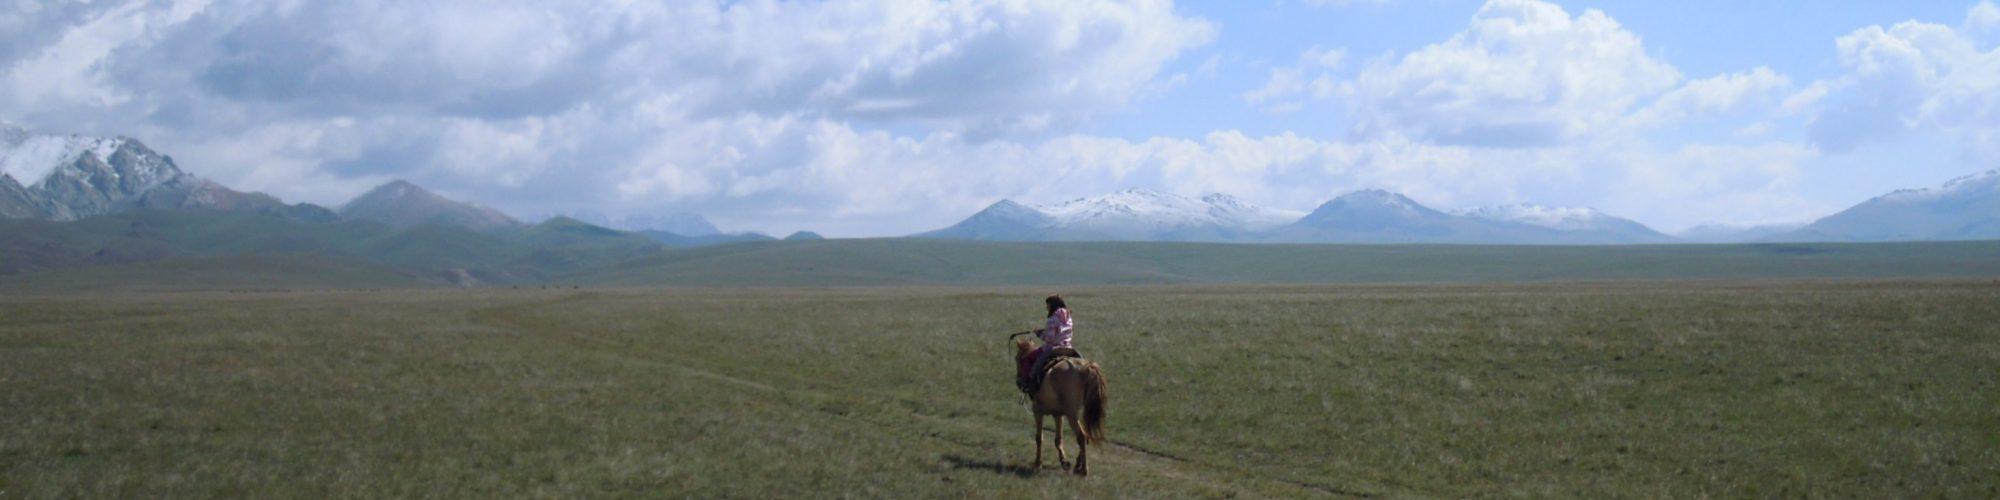 Kirgistan Bewusstsein Schöpfer Feld by Birgit Strauch Shiatsu & ThetaHealing